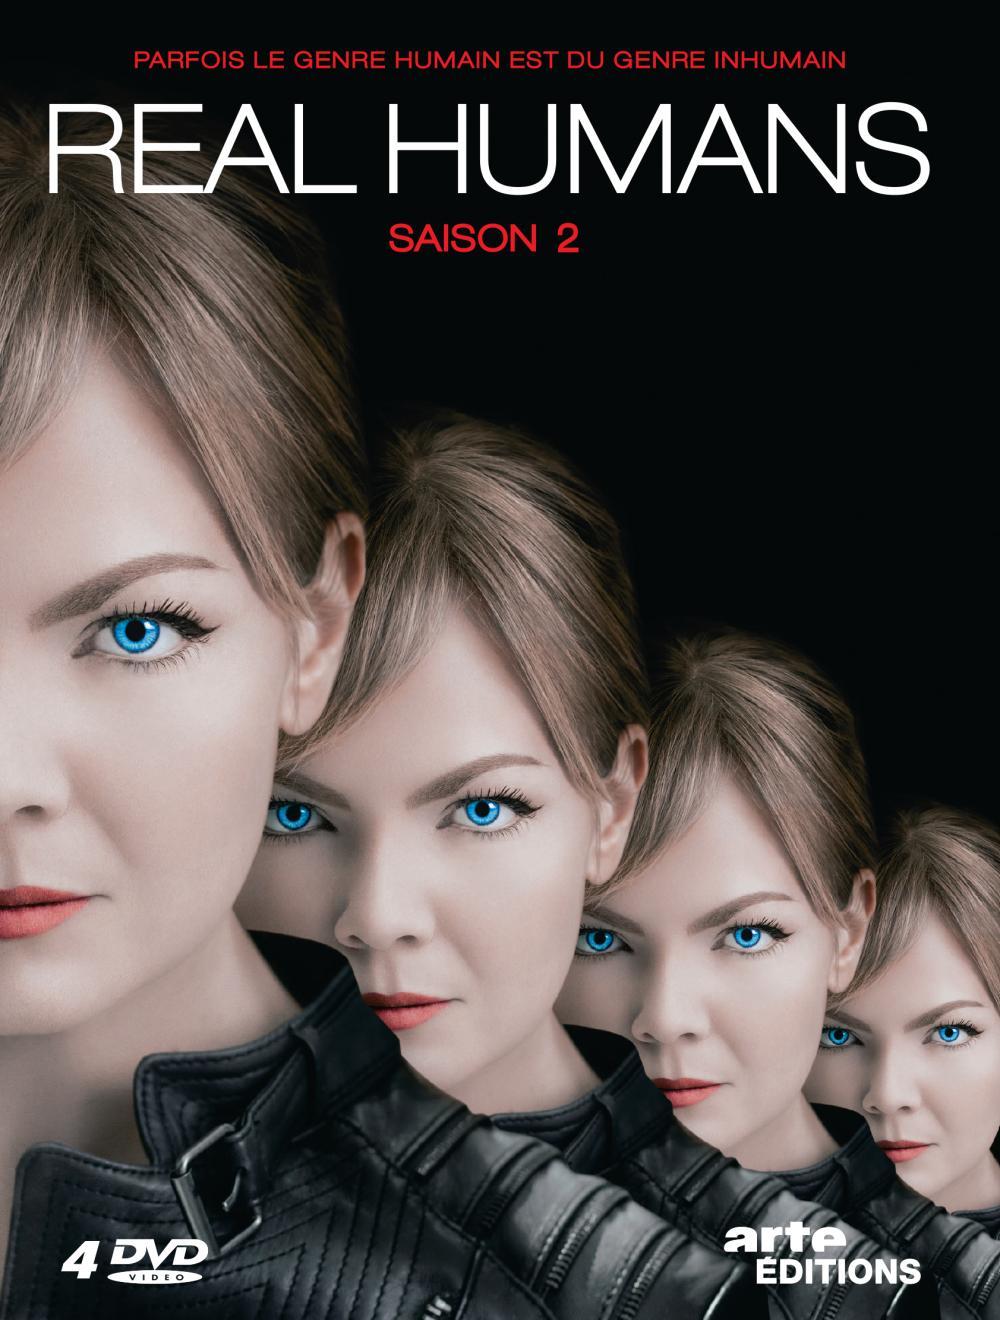 Real Humans: Season 2